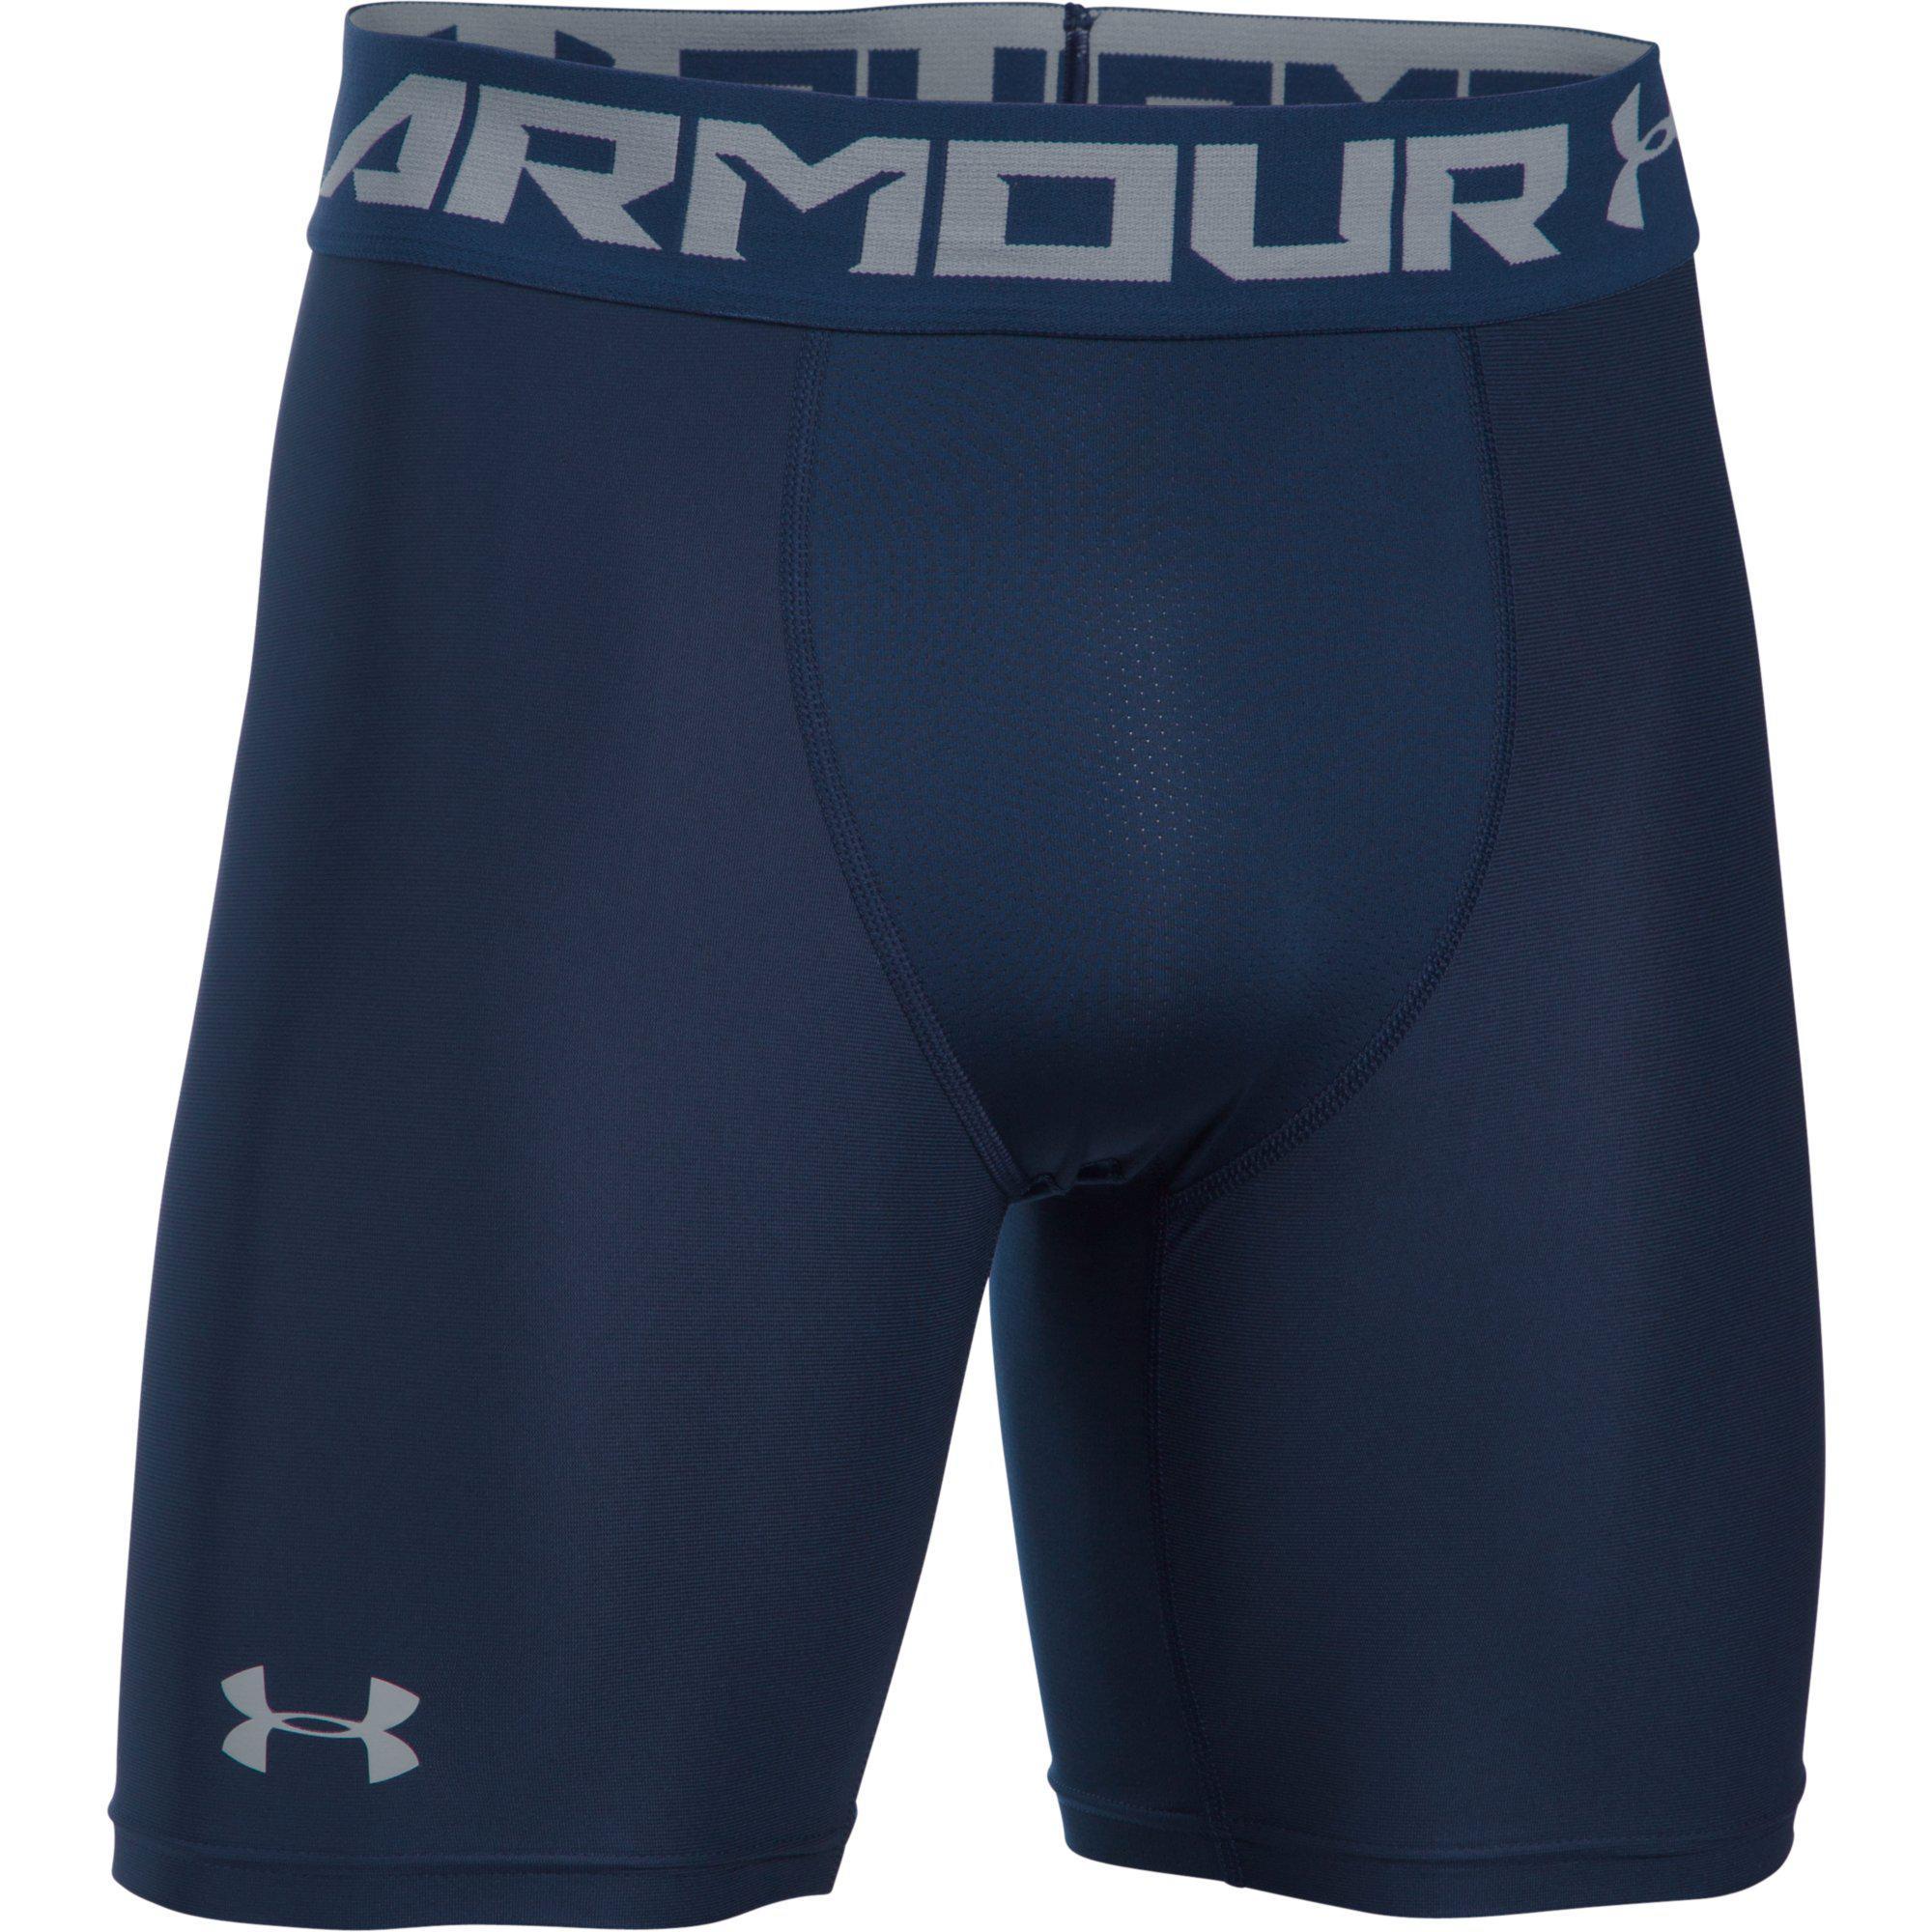 Under Armour Mens HeatGear 2.0 Compression Short ... Compression Shorts For Men Under Armour